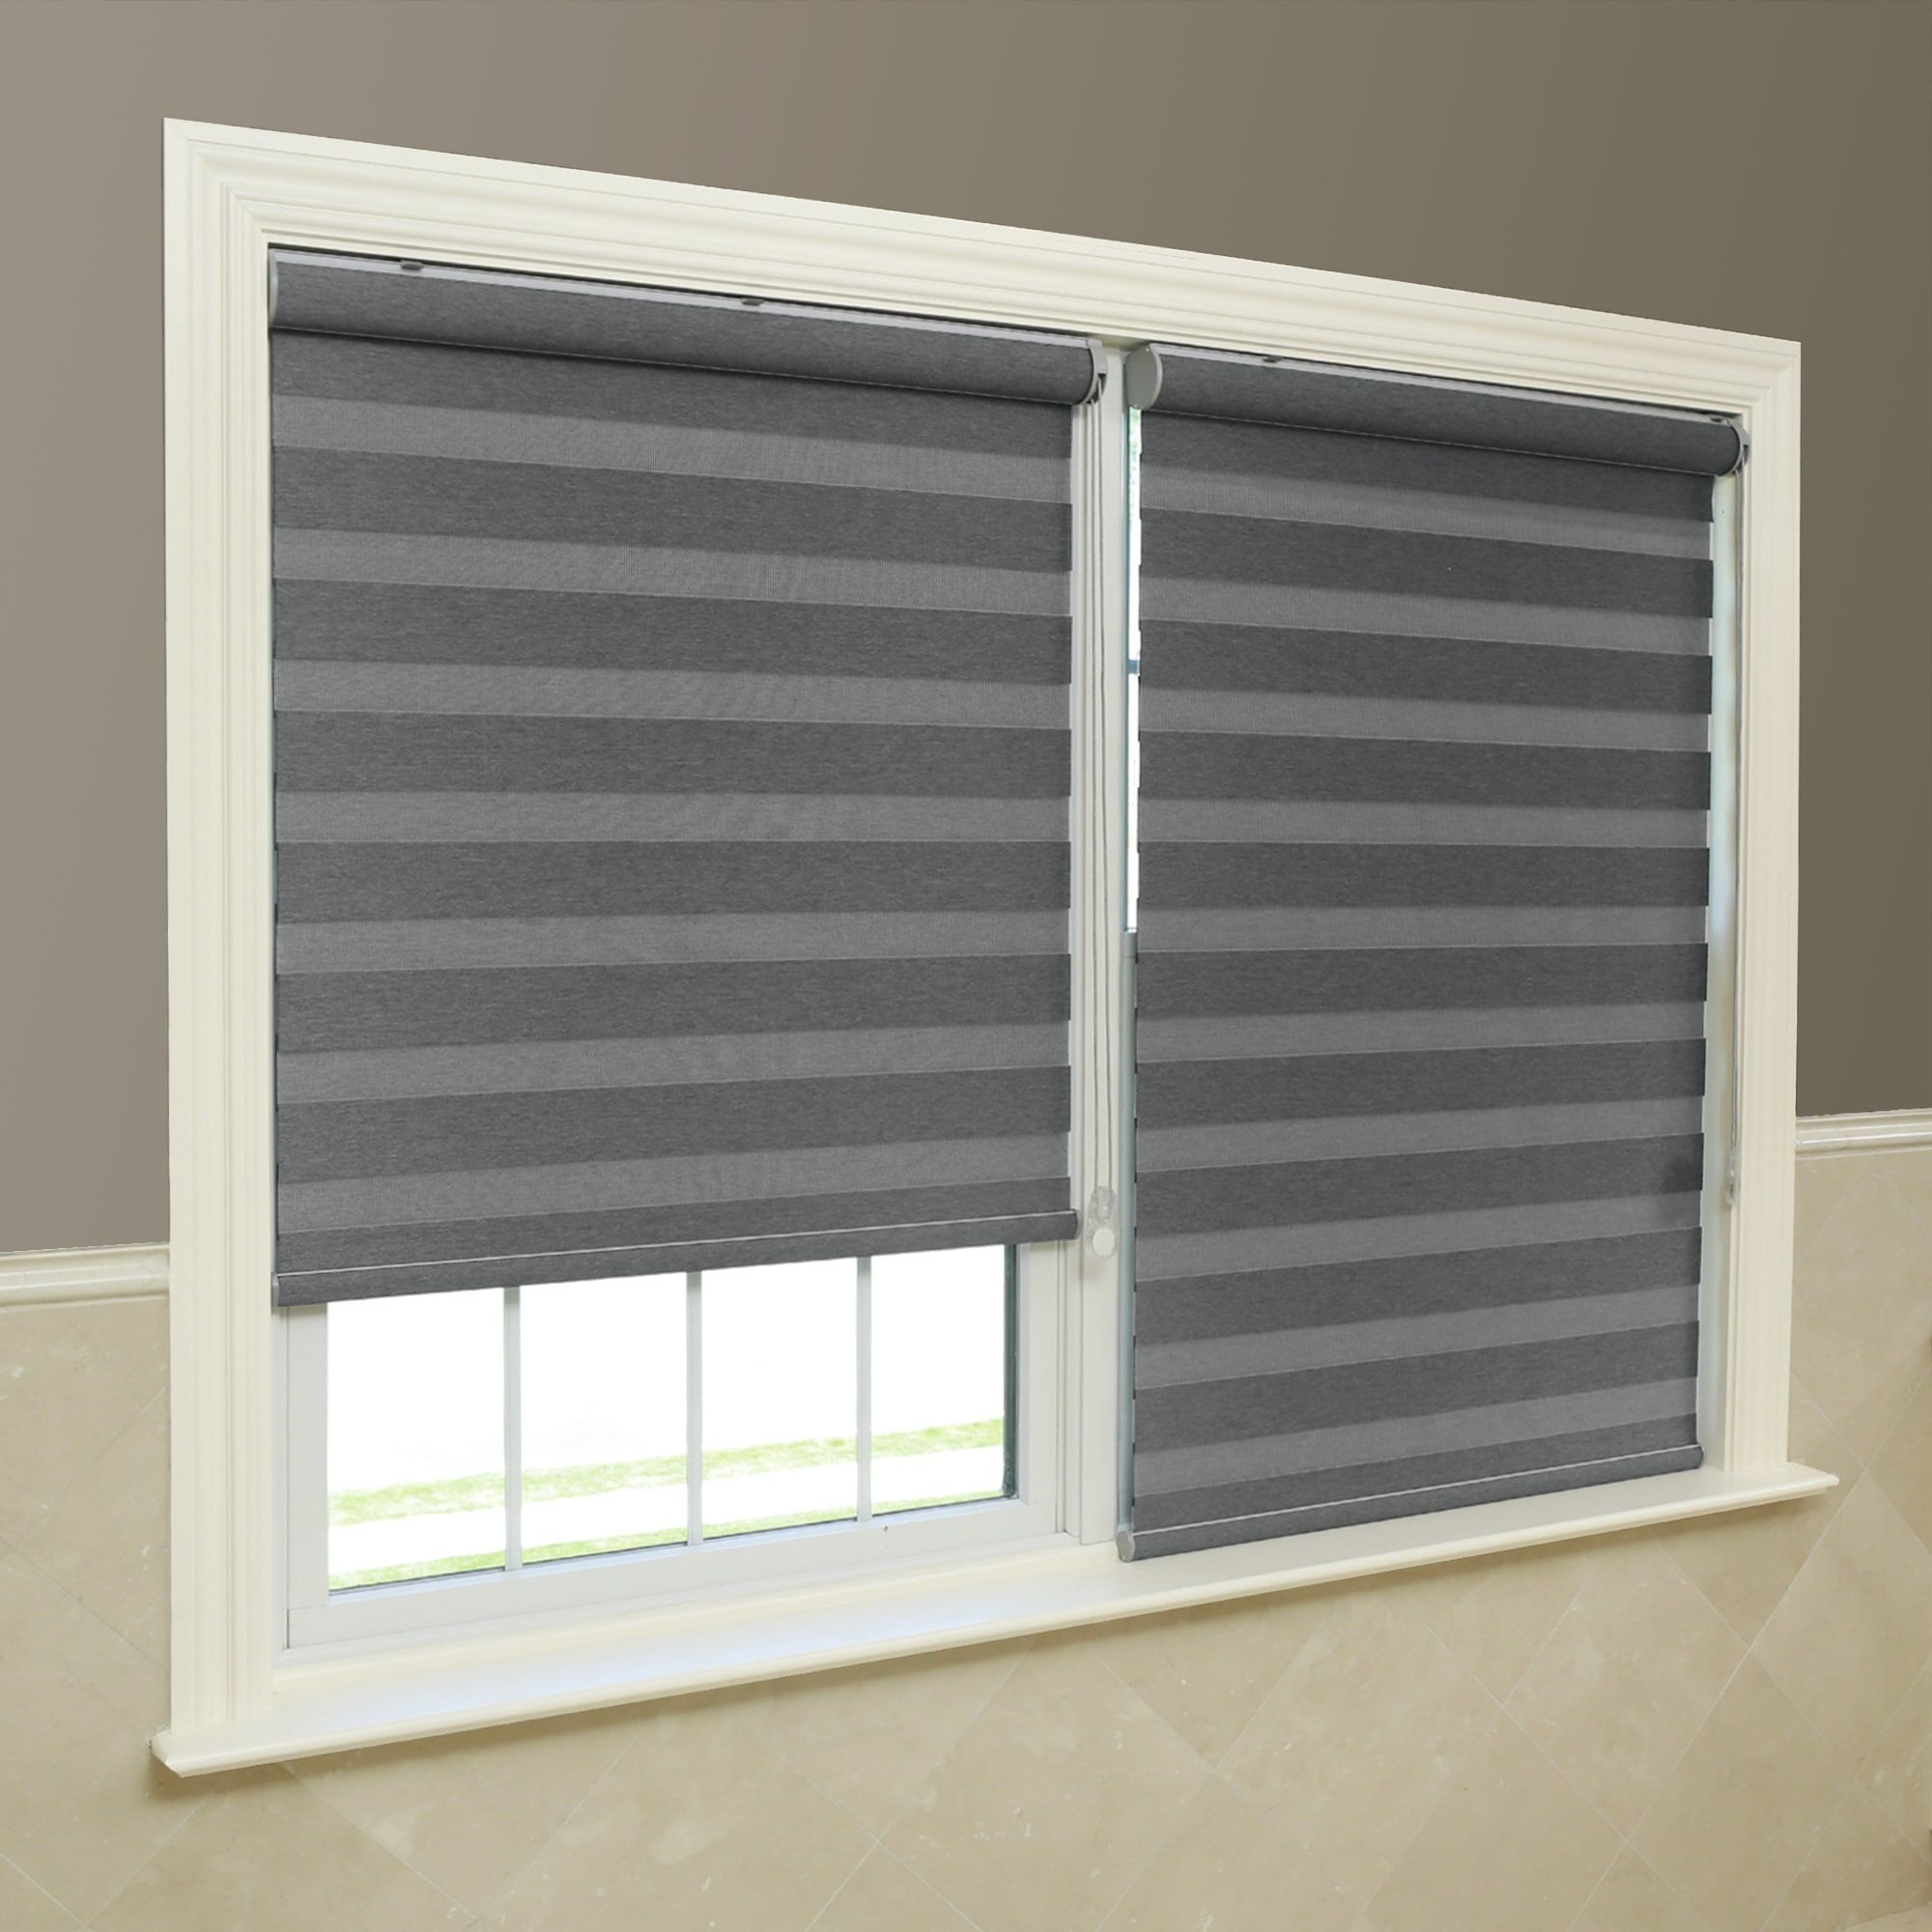 Aurora Home Premium Fabric Grey Sunshut Blackout Window Shade 26